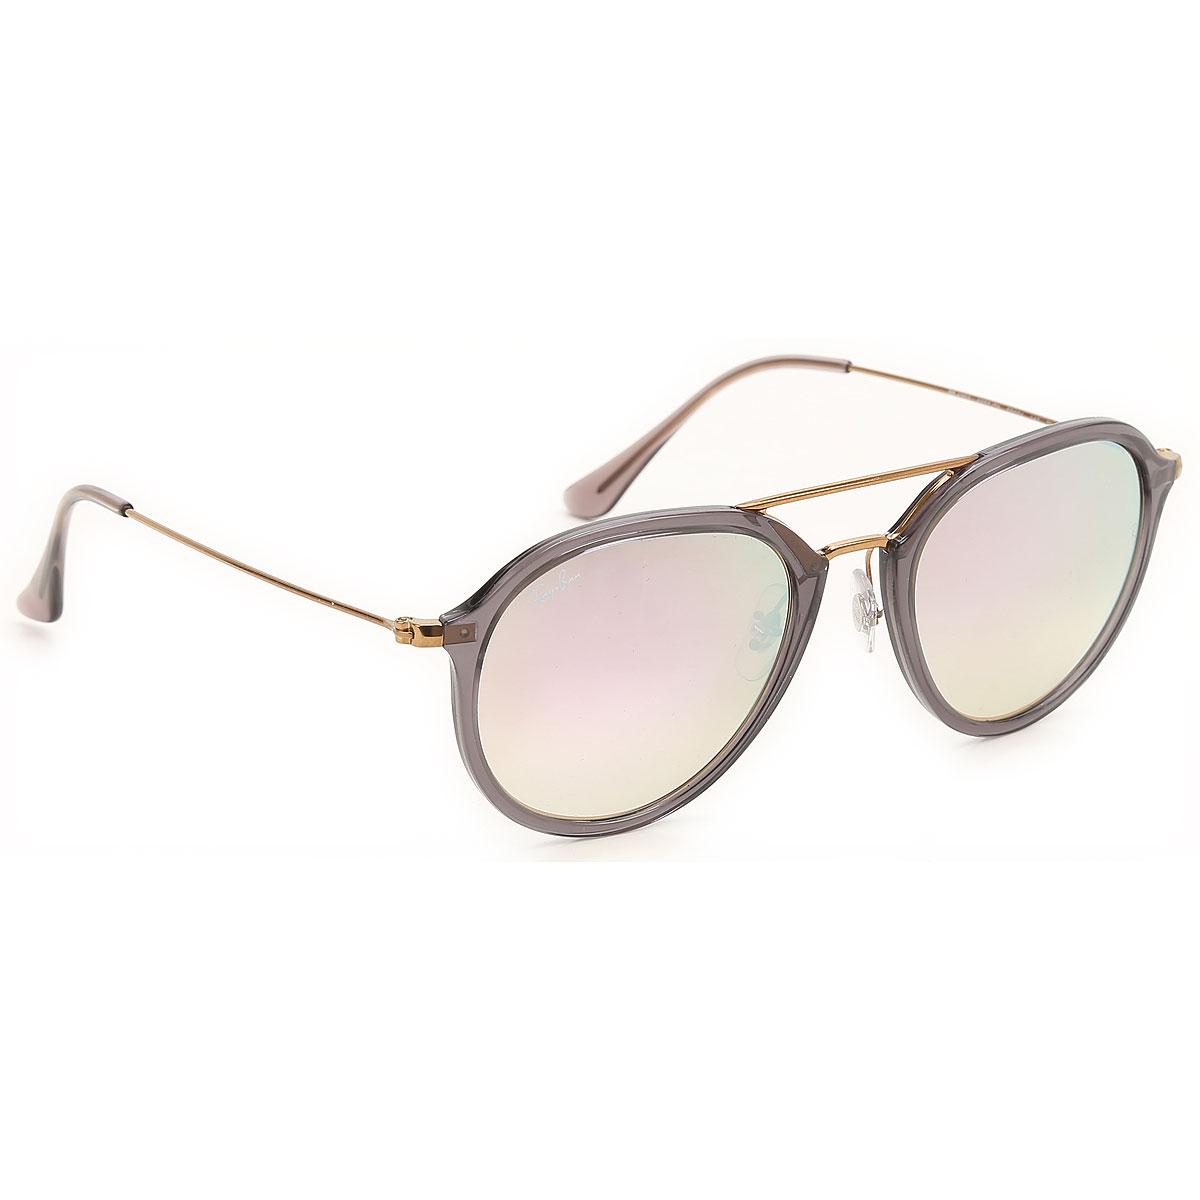 Ray Ban Sunglasses On Sale, Transparent Grey, 2019